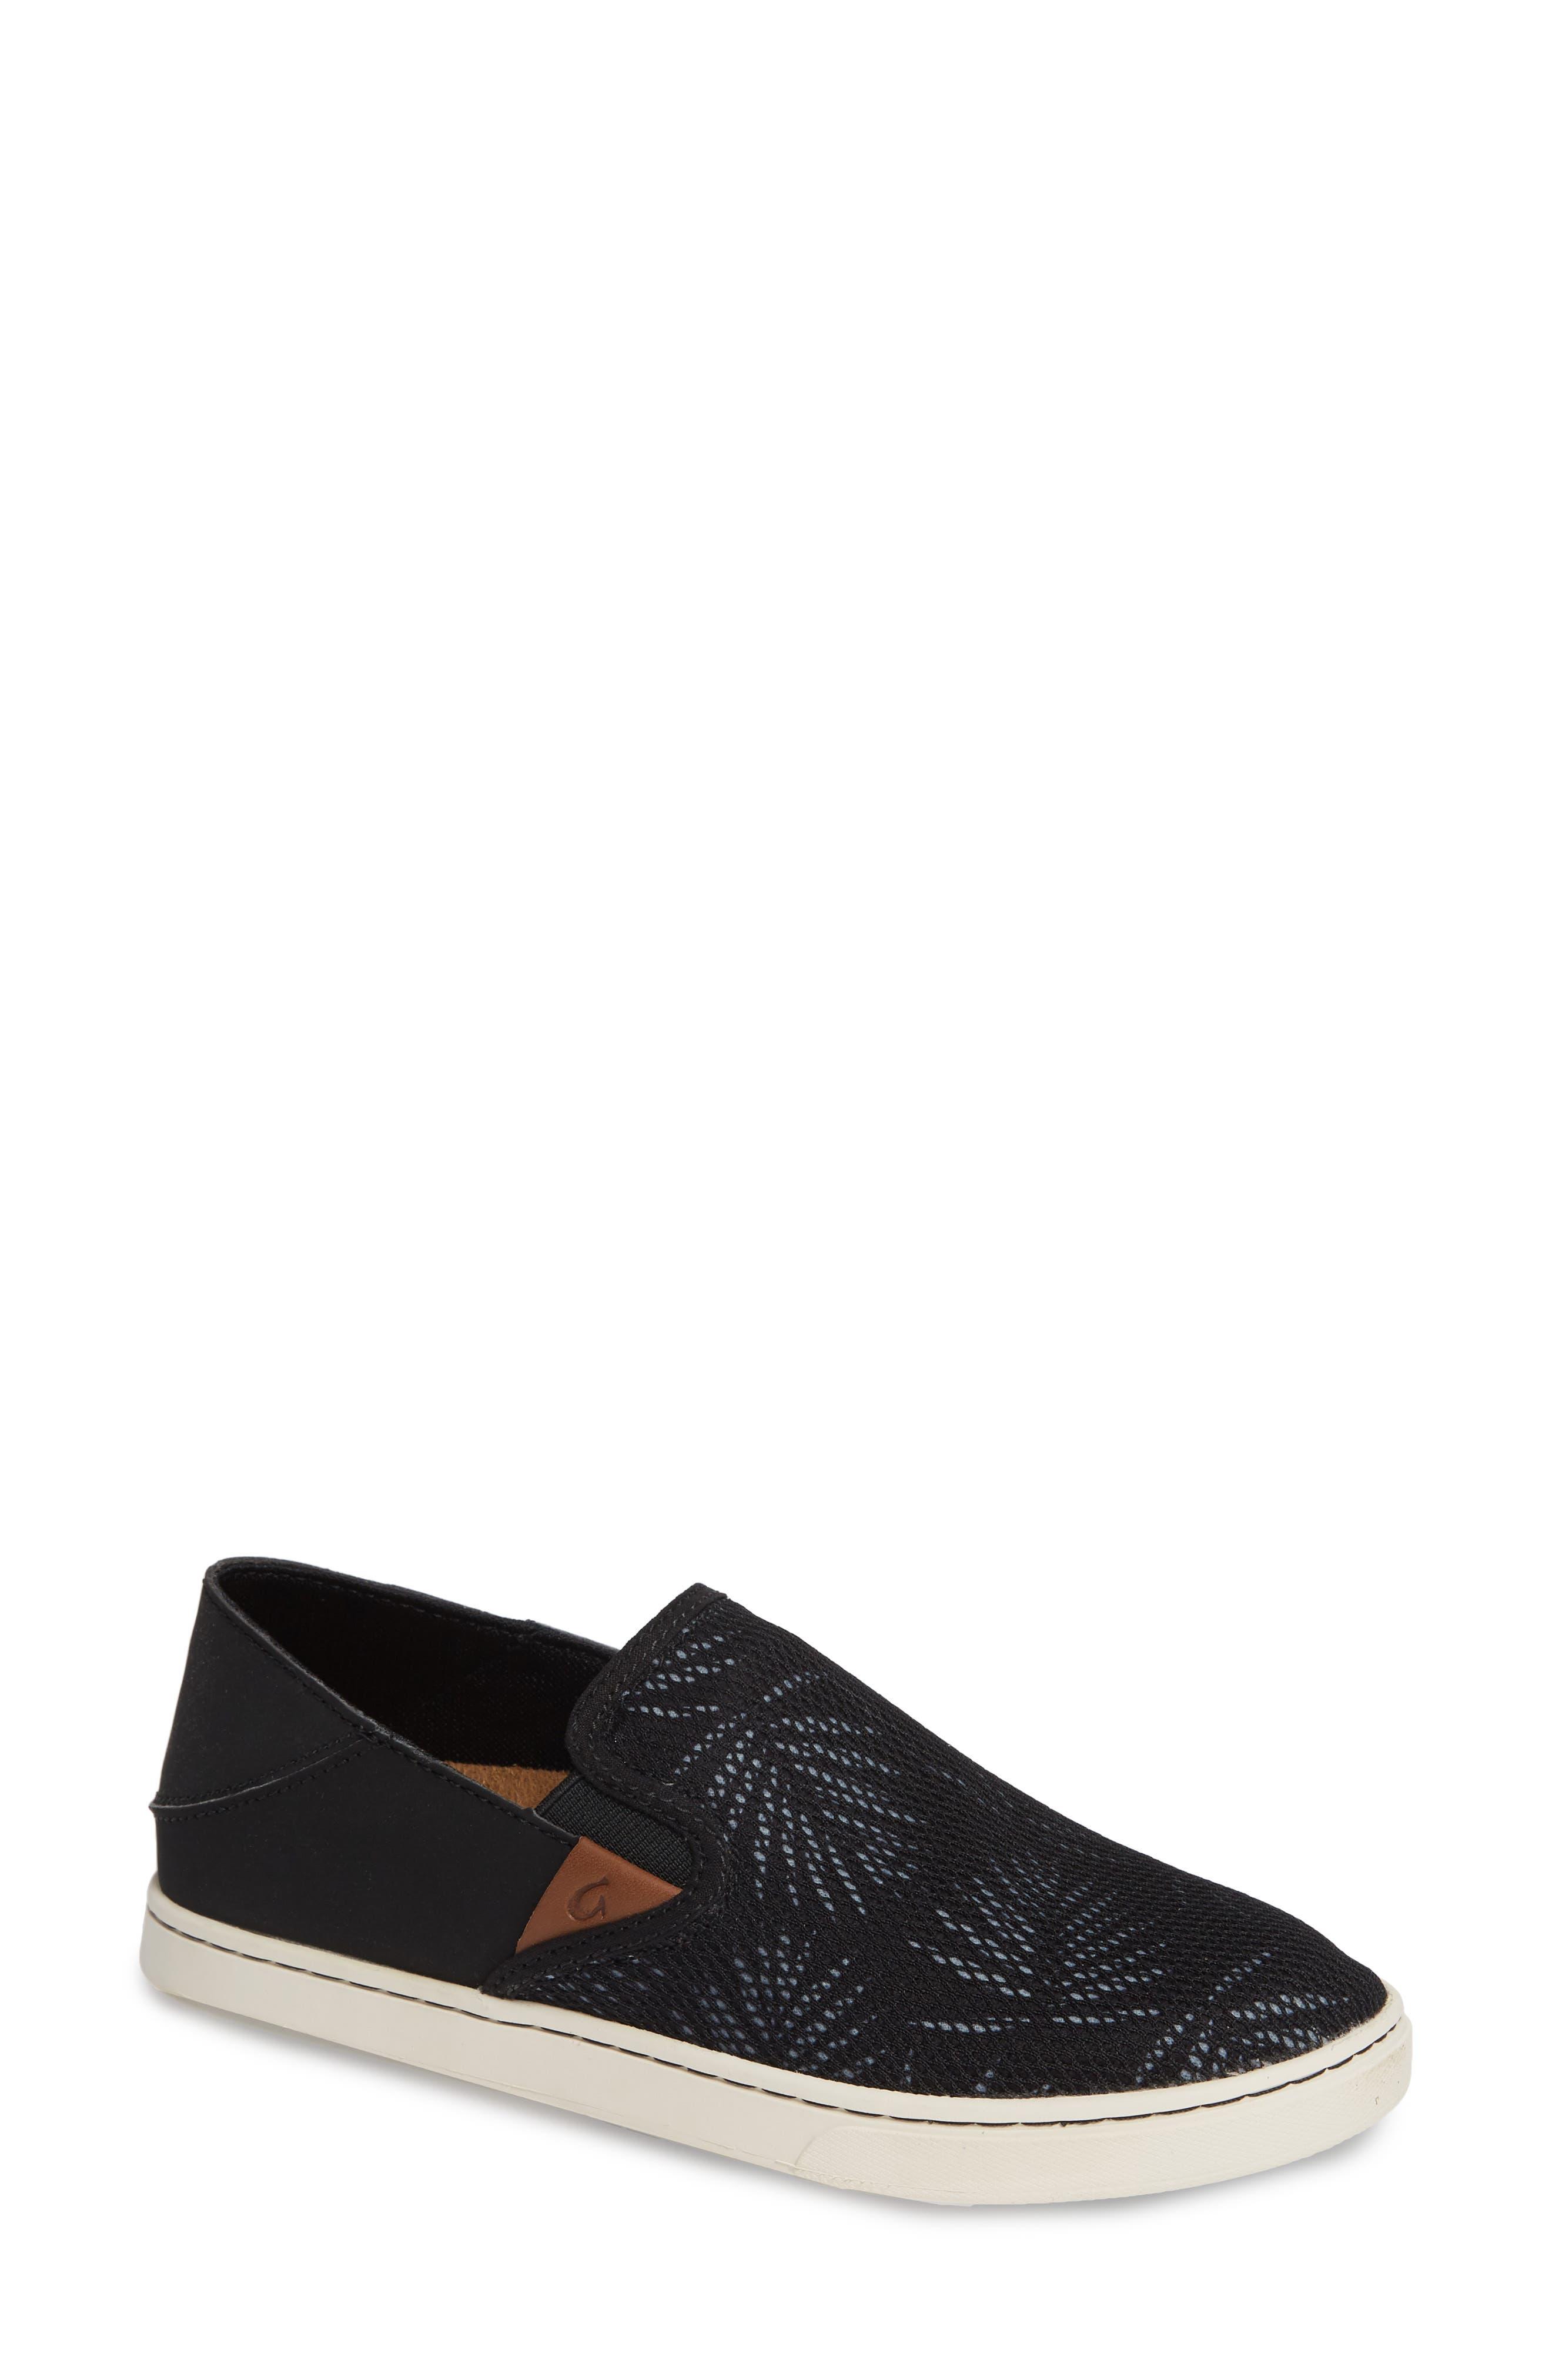 OLUKAI, 'Pehuea' Slip-On Sneaker, Main thumbnail 1, color, BLACK/ PALM FABRIC